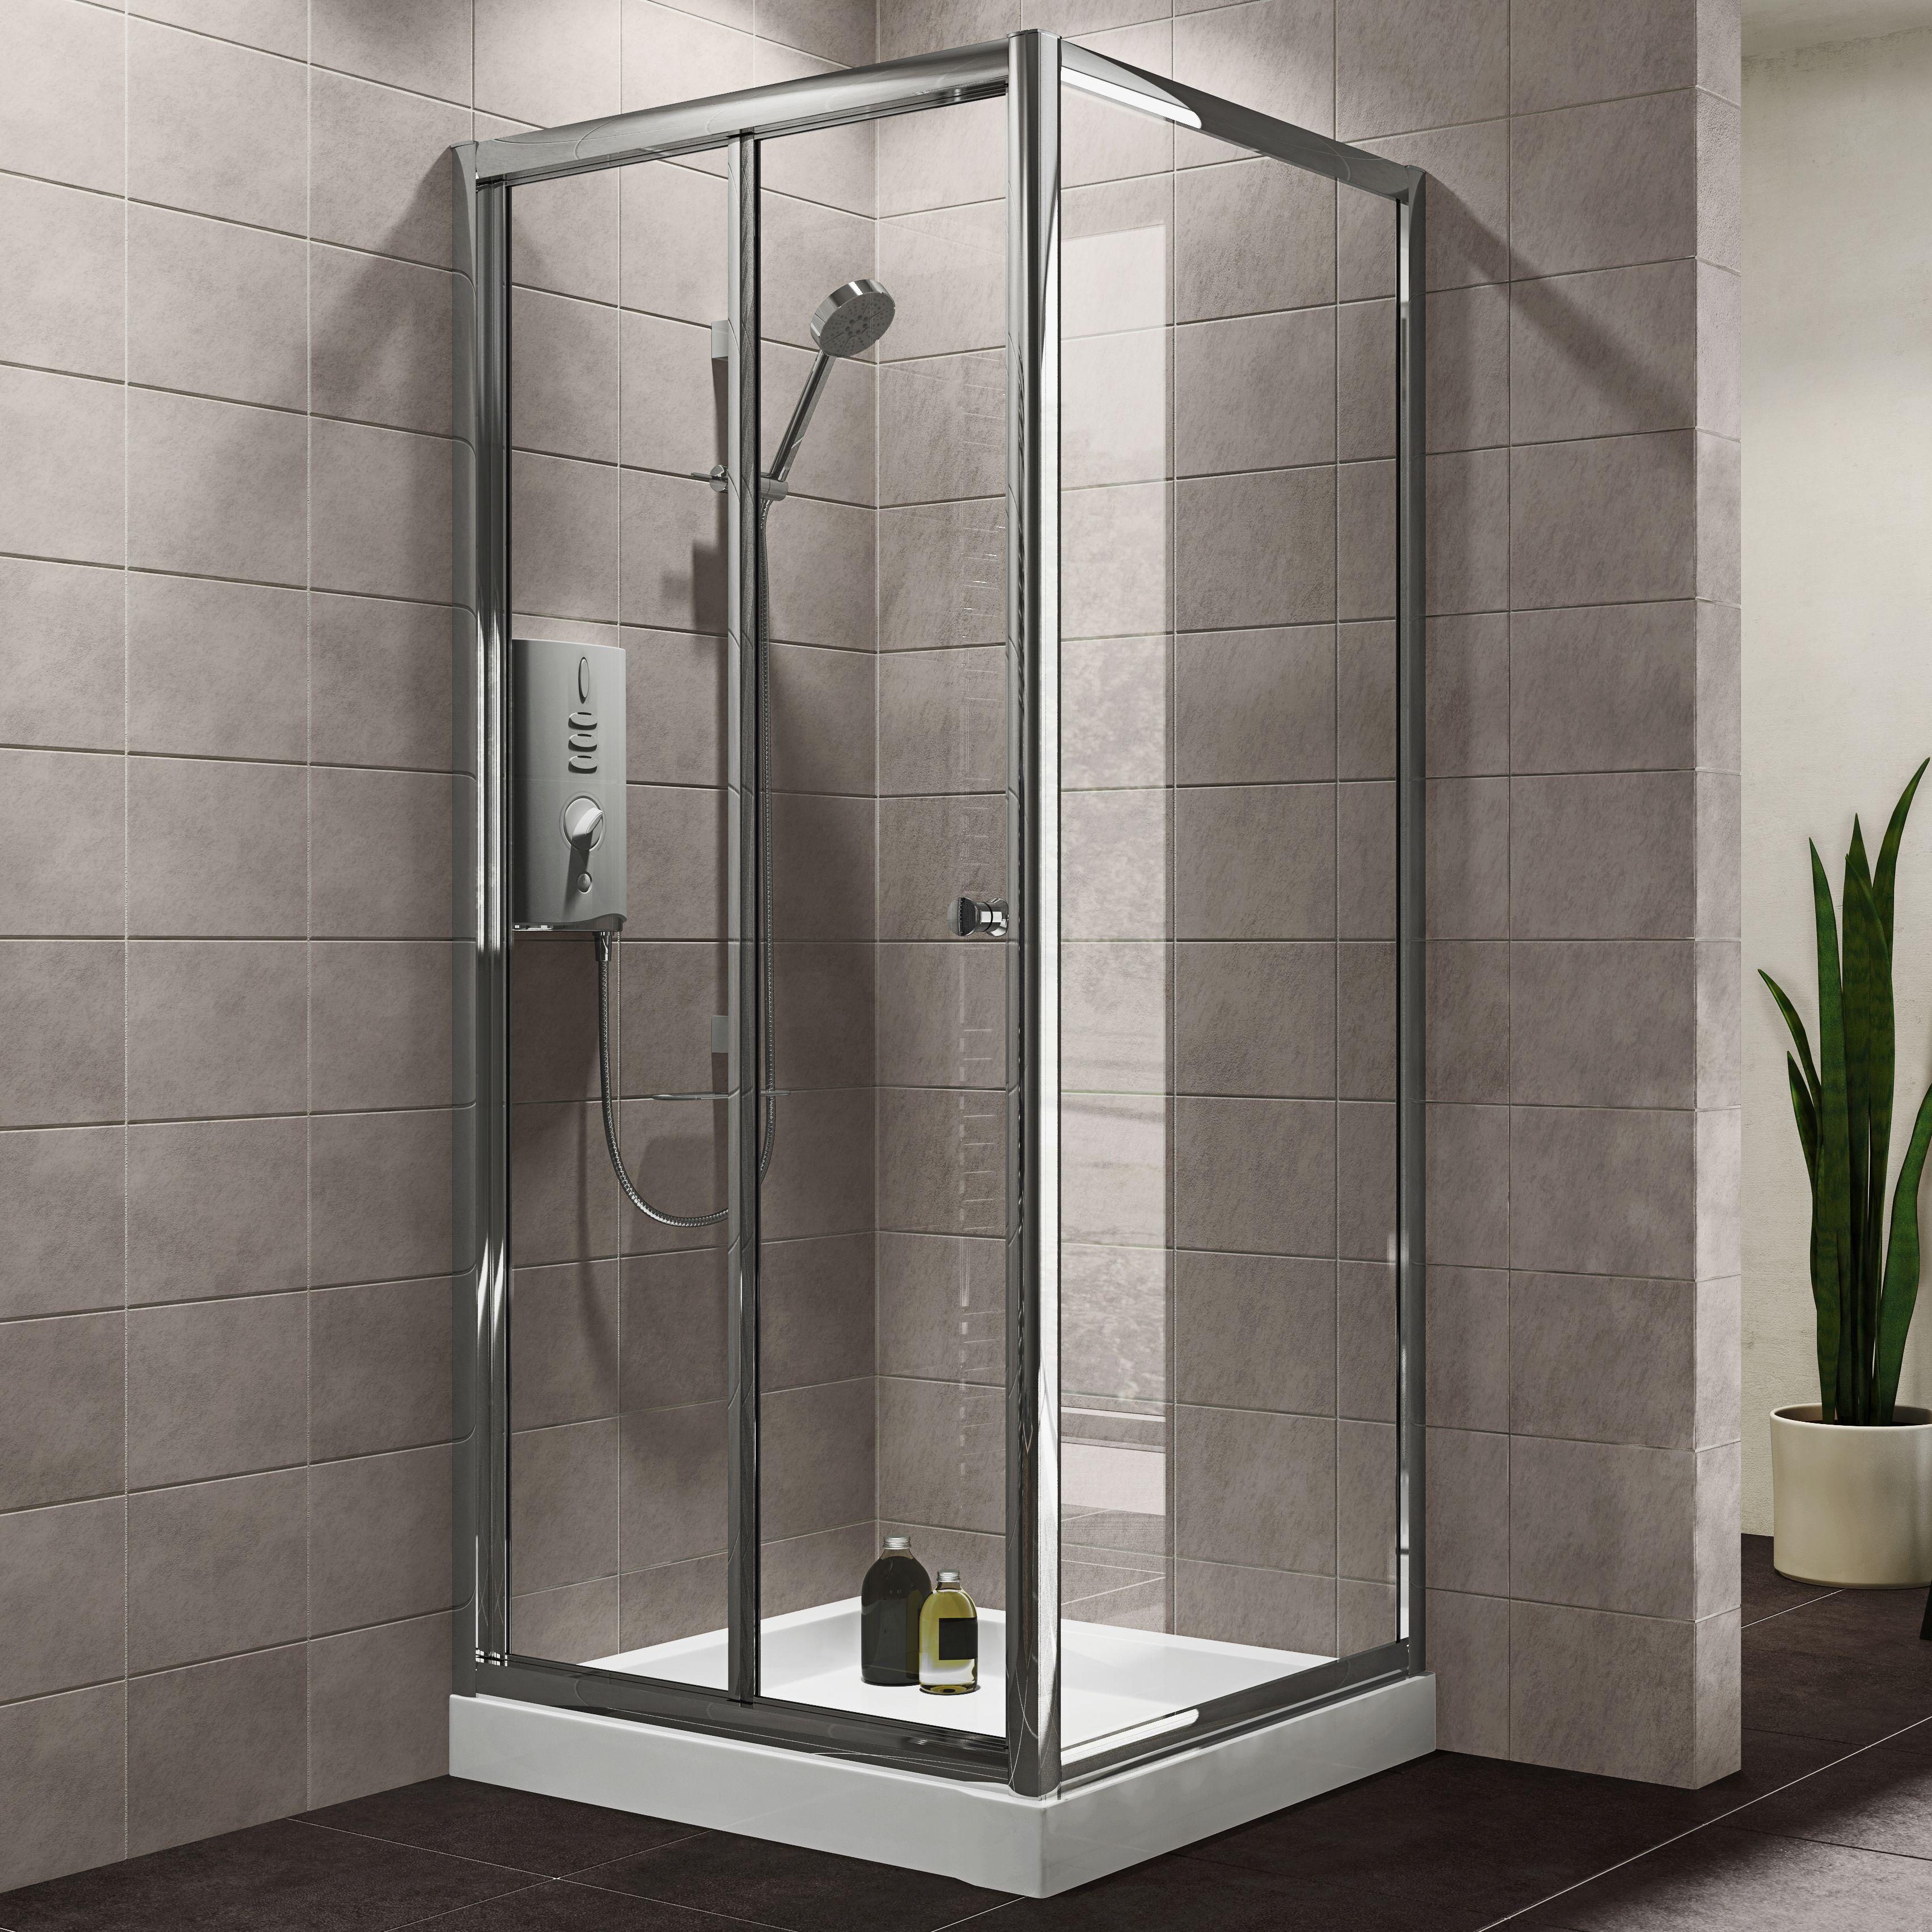 Plumbsure Square Shower Enclosure With Bi-fold Door (w)800mm (d)800mm